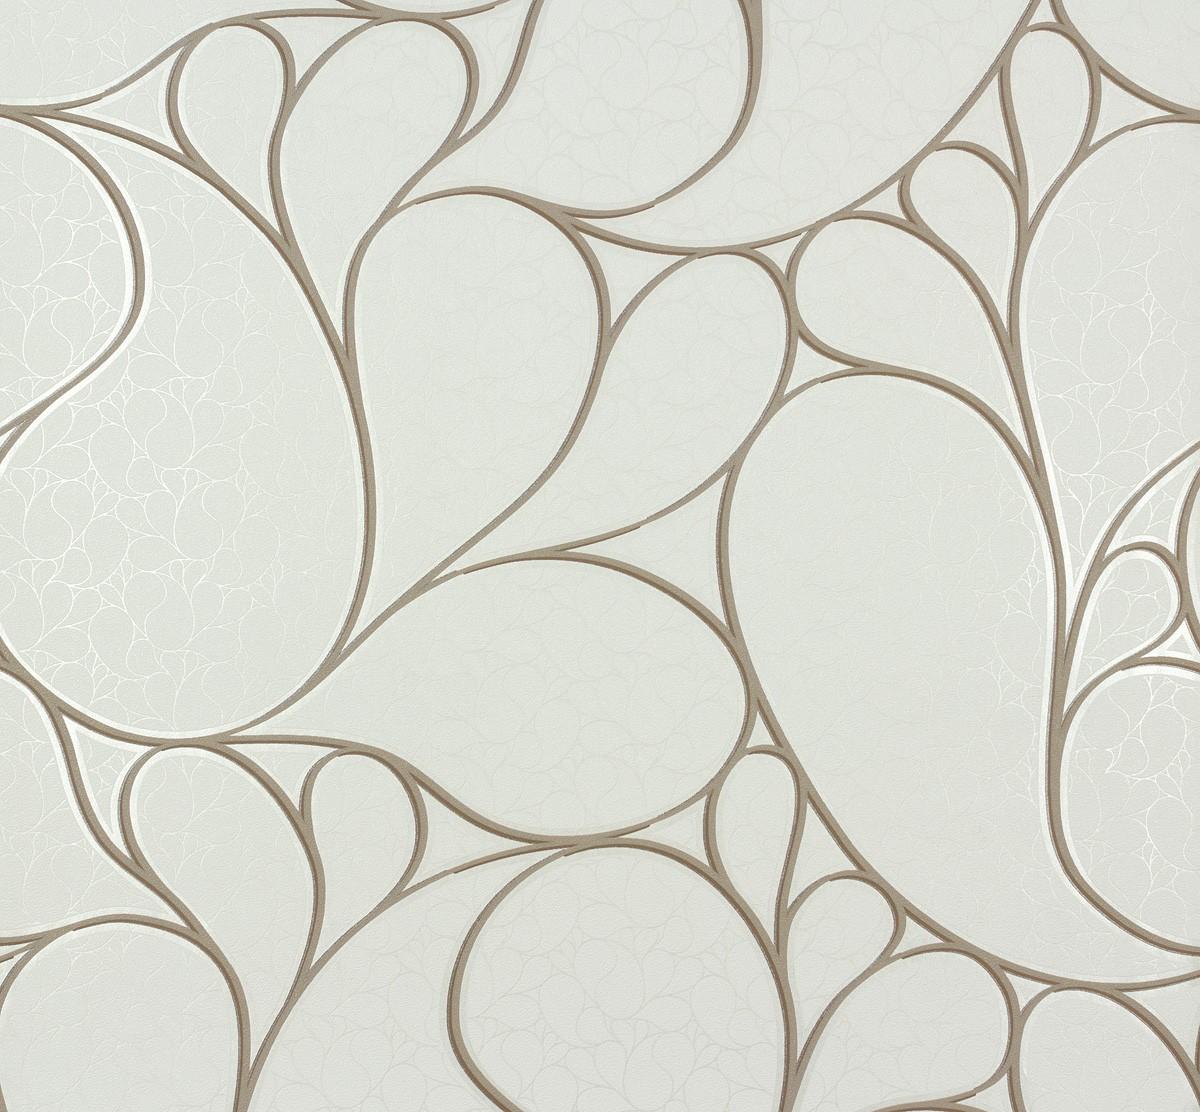 vliestapete marburg messina tapete 55425 design modern wei beige. Black Bedroom Furniture Sets. Home Design Ideas